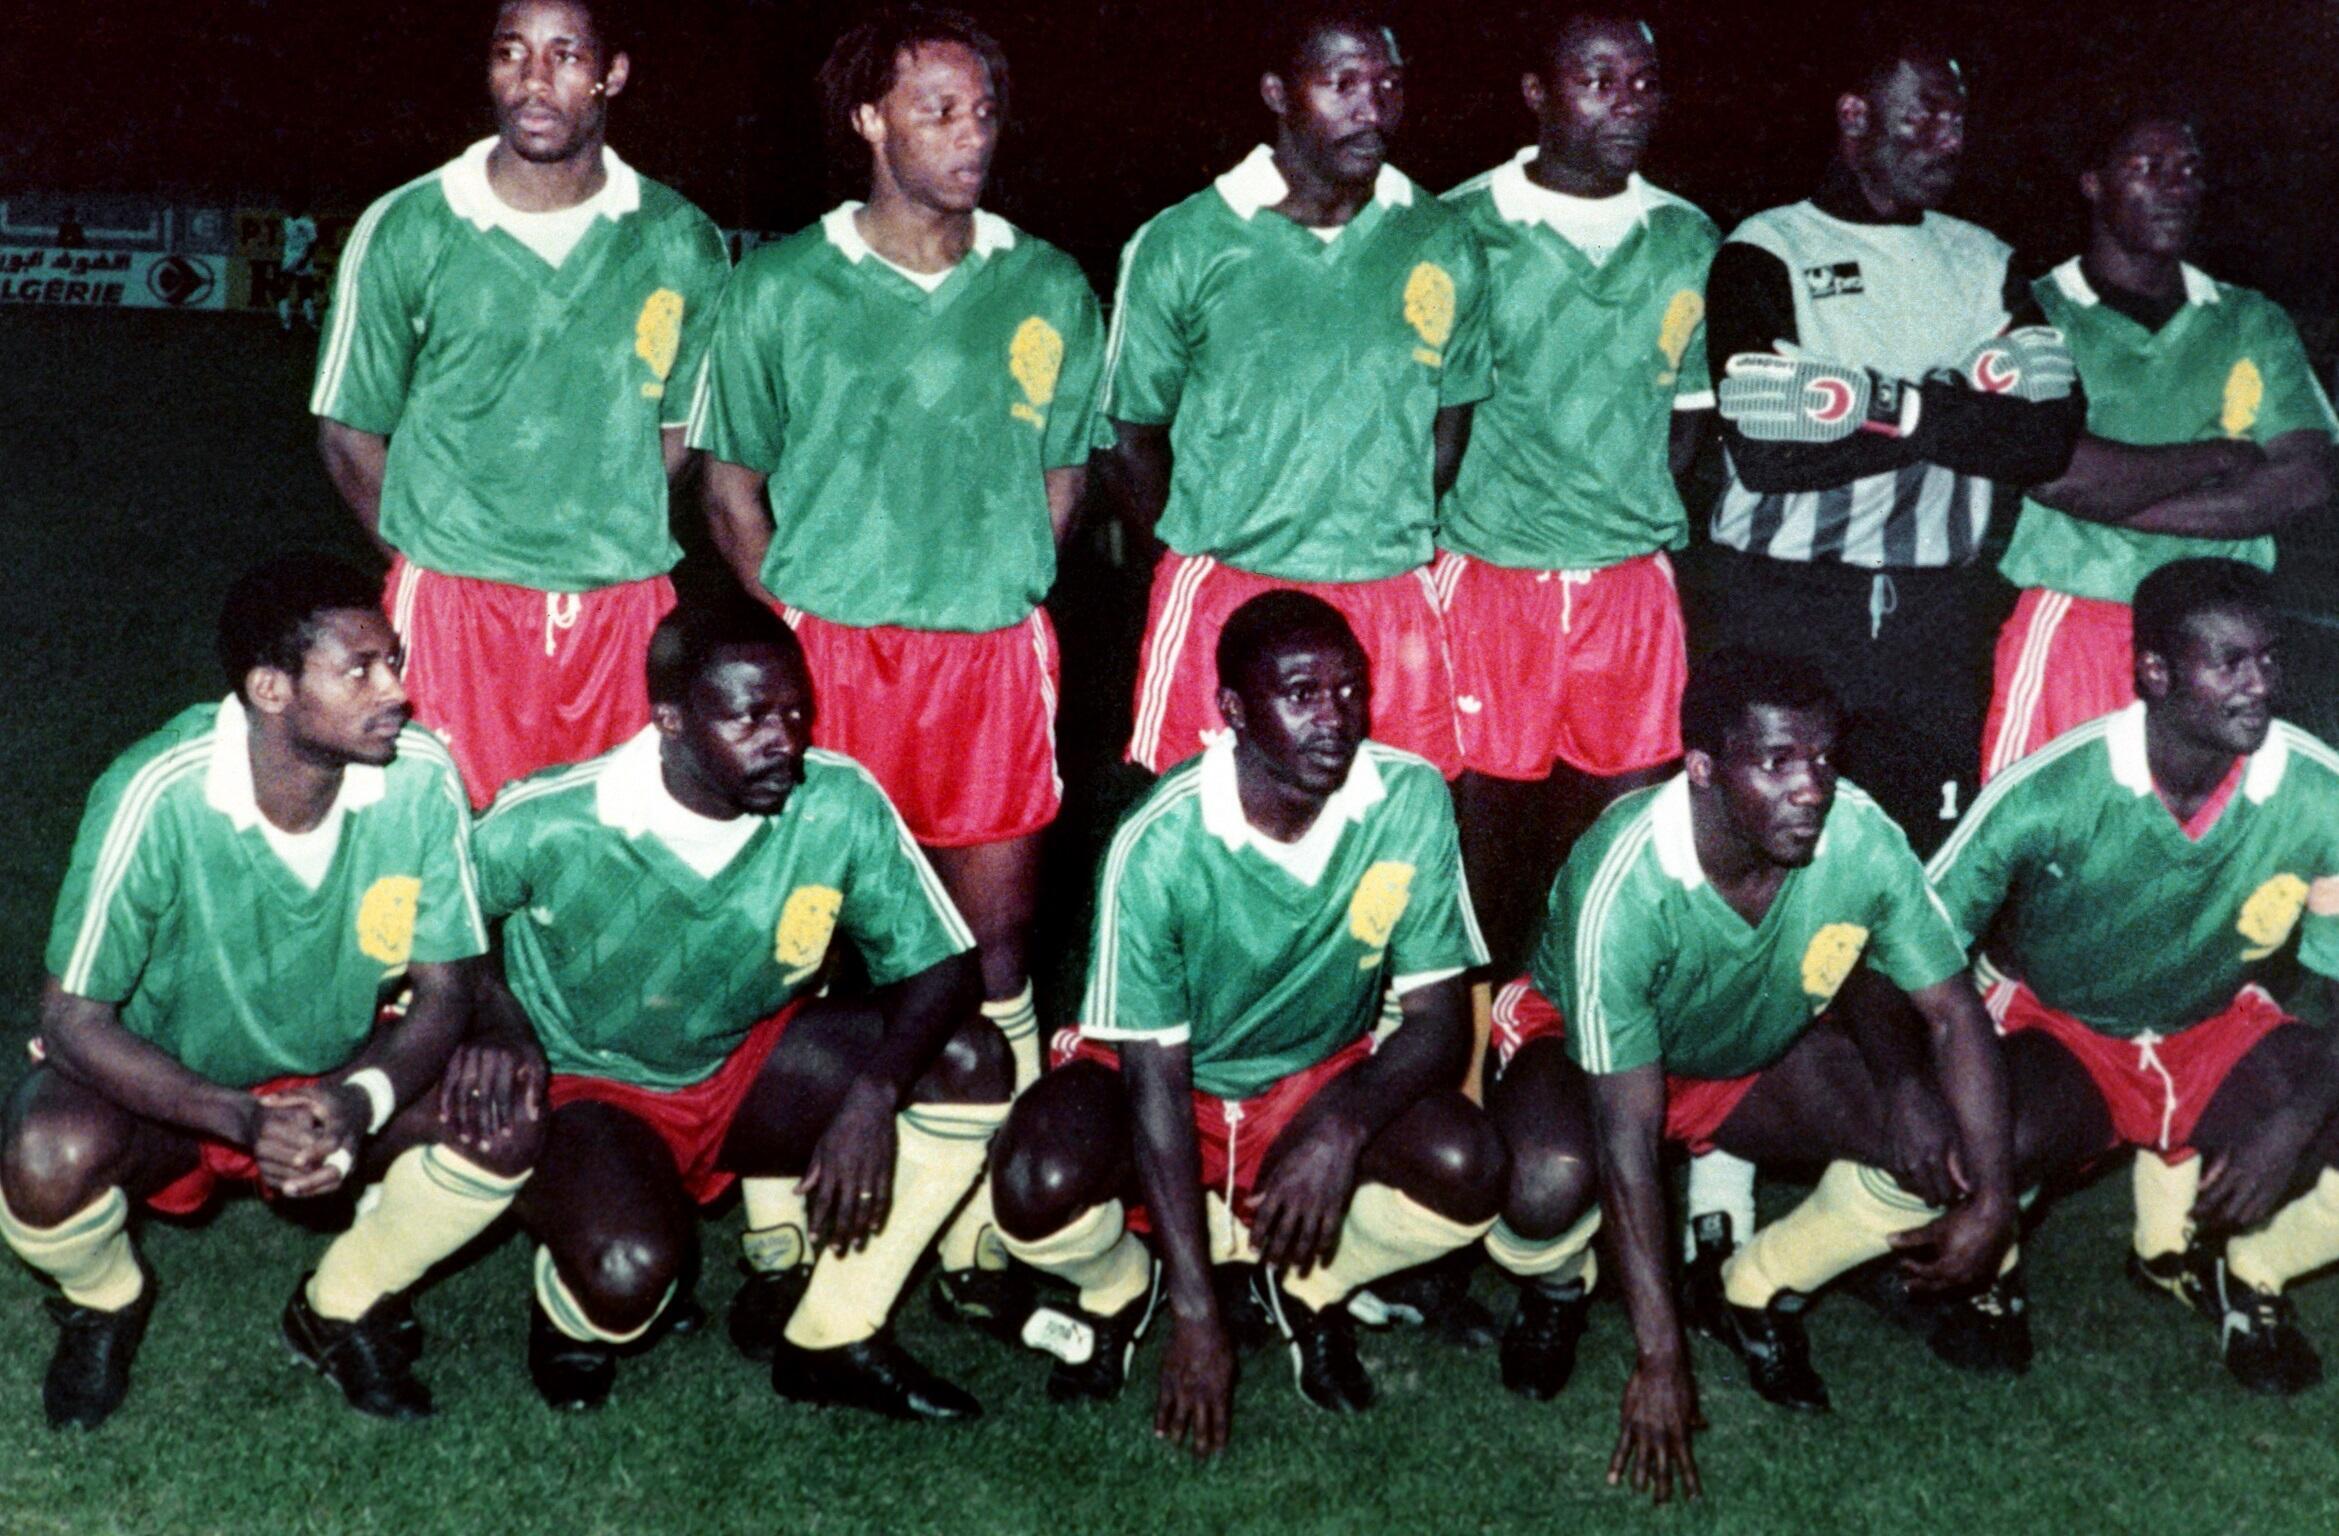 L'équipe nationale de football du Cameroun, en avril 1990, avec Benjamin Massing en haut à gauche (debout).